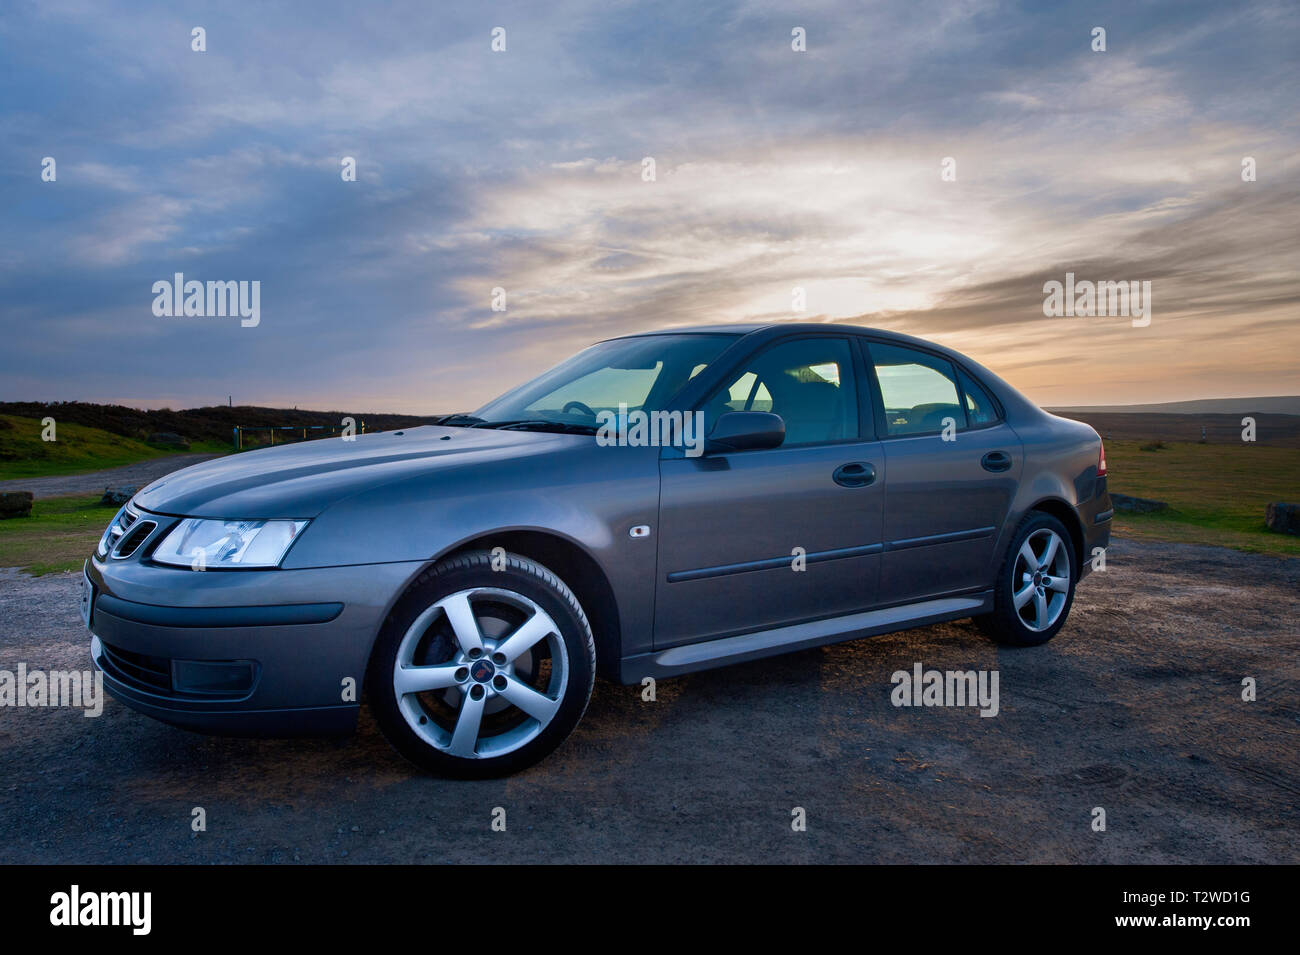 Saab 9-3 Car - Stock Image